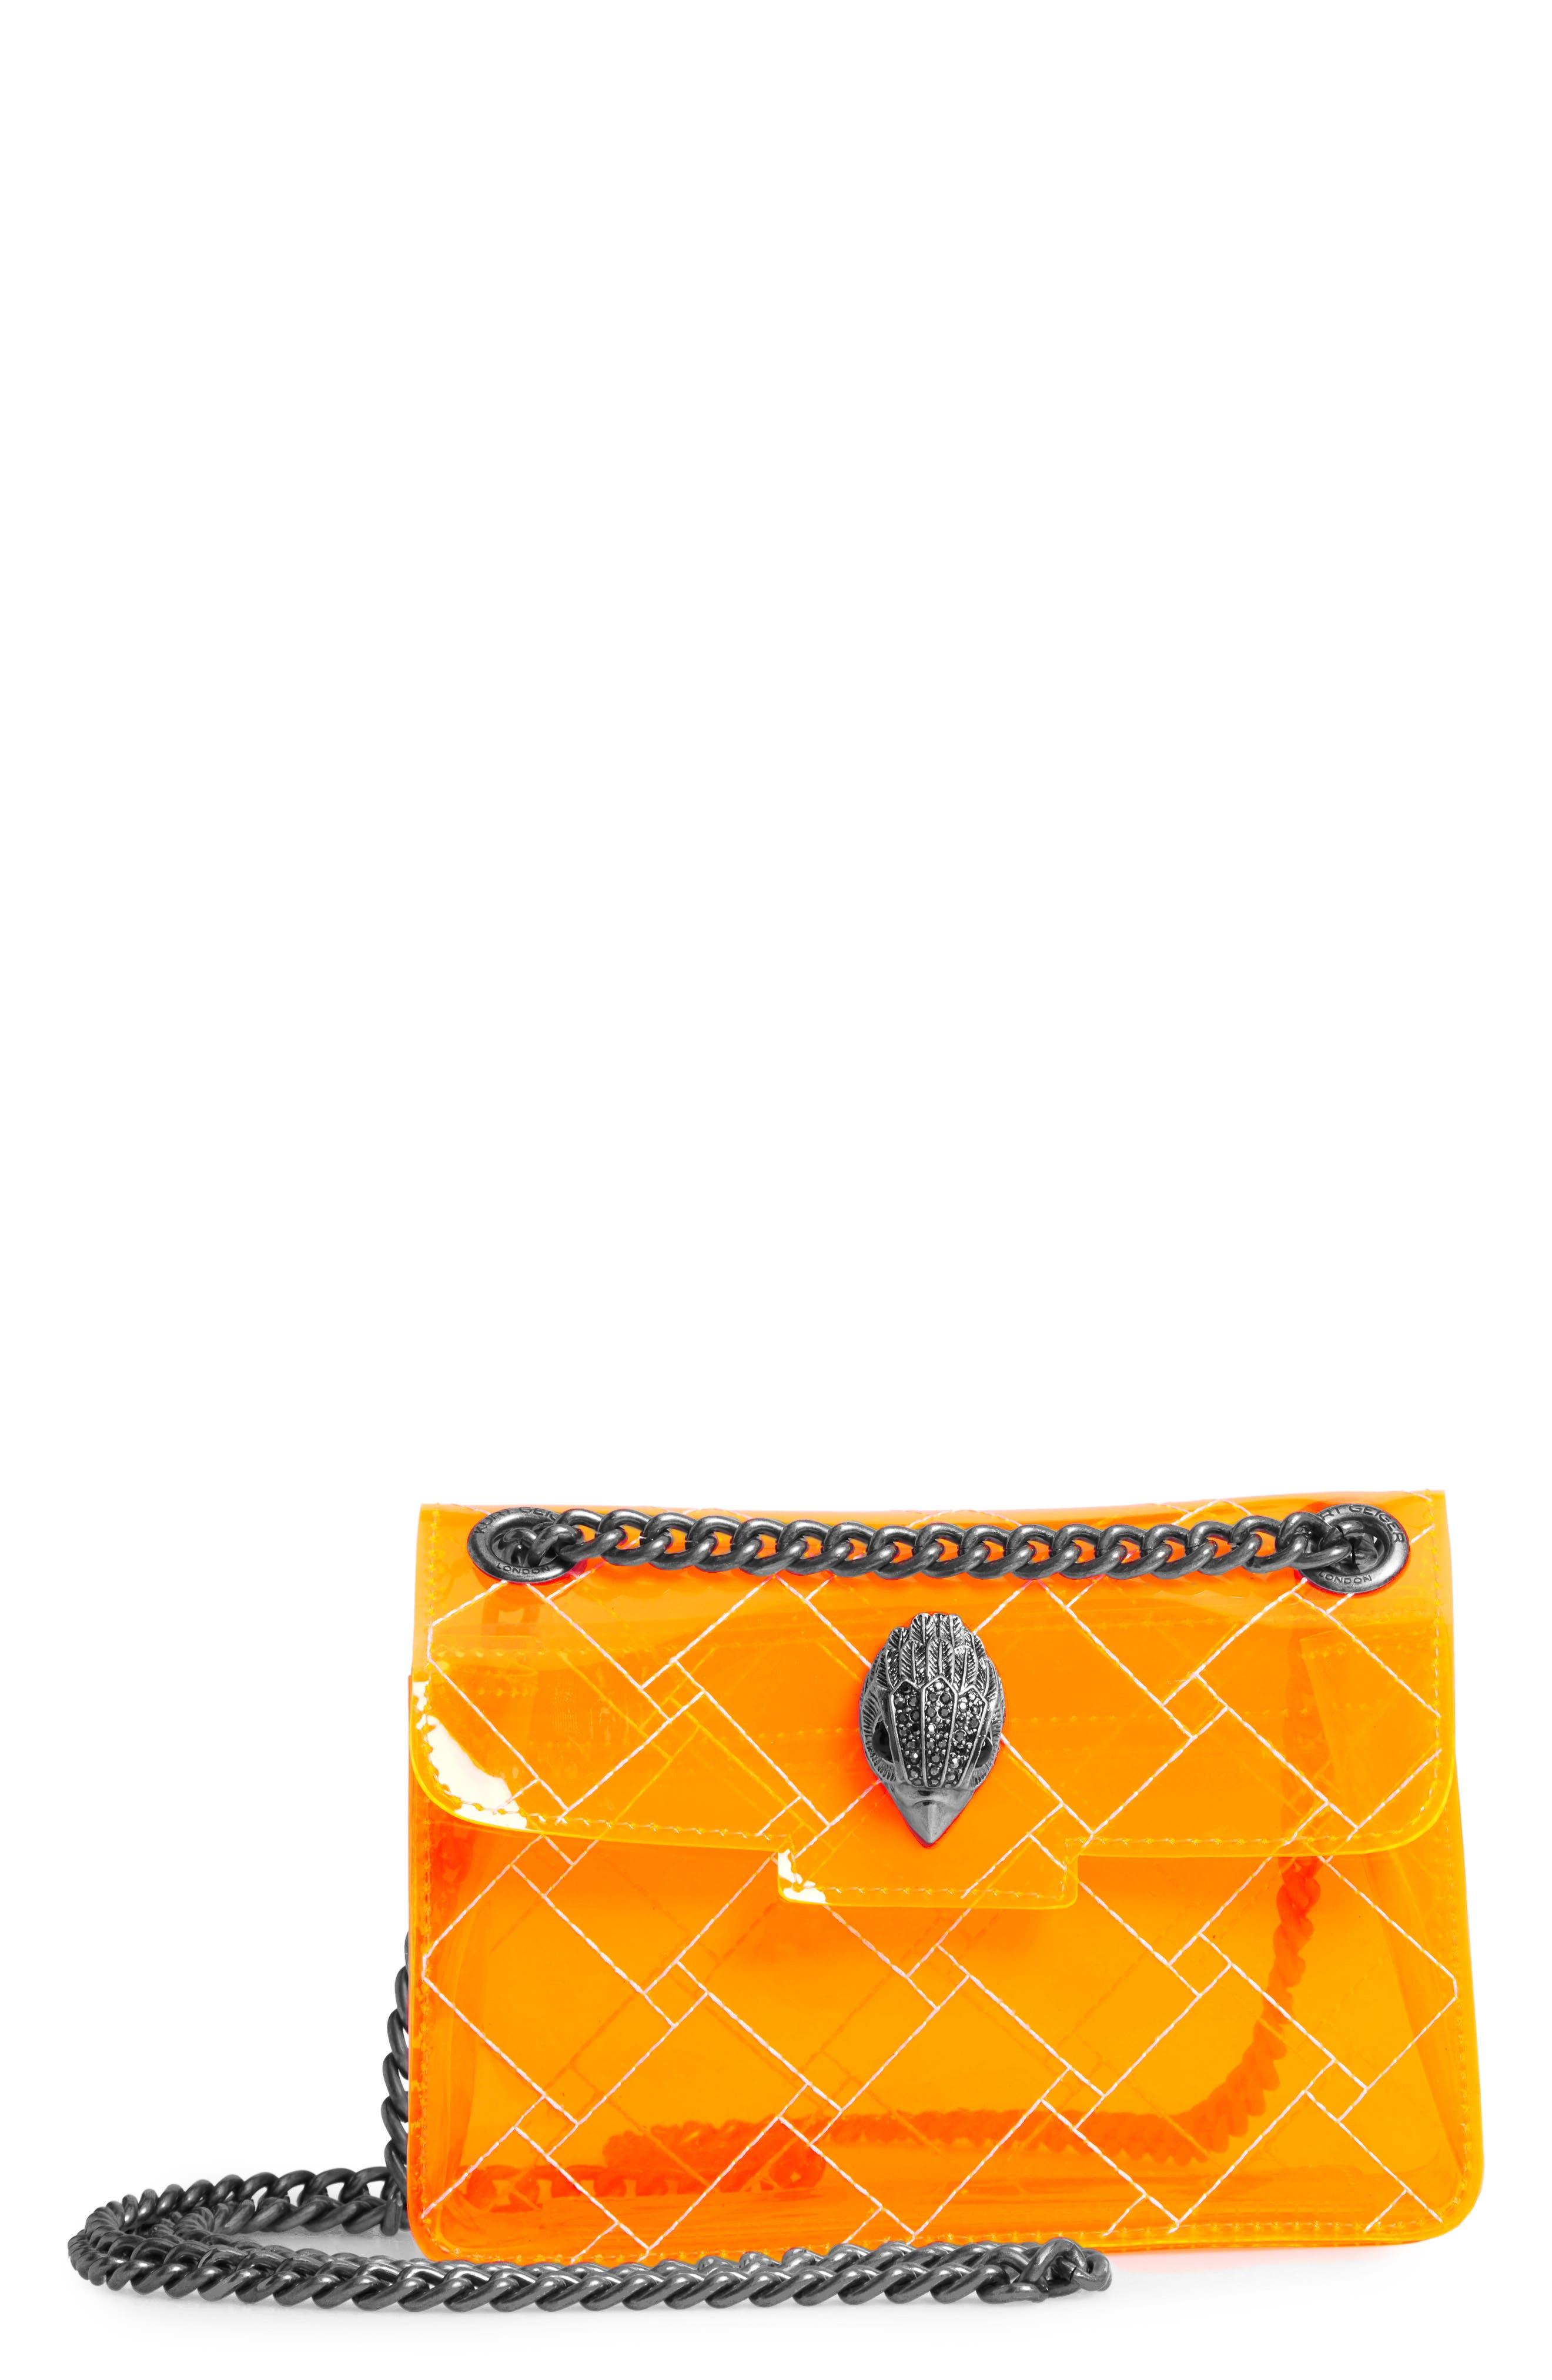 Image of Kurt Geiger London Mini Kensington Transparent Shoulder Bag